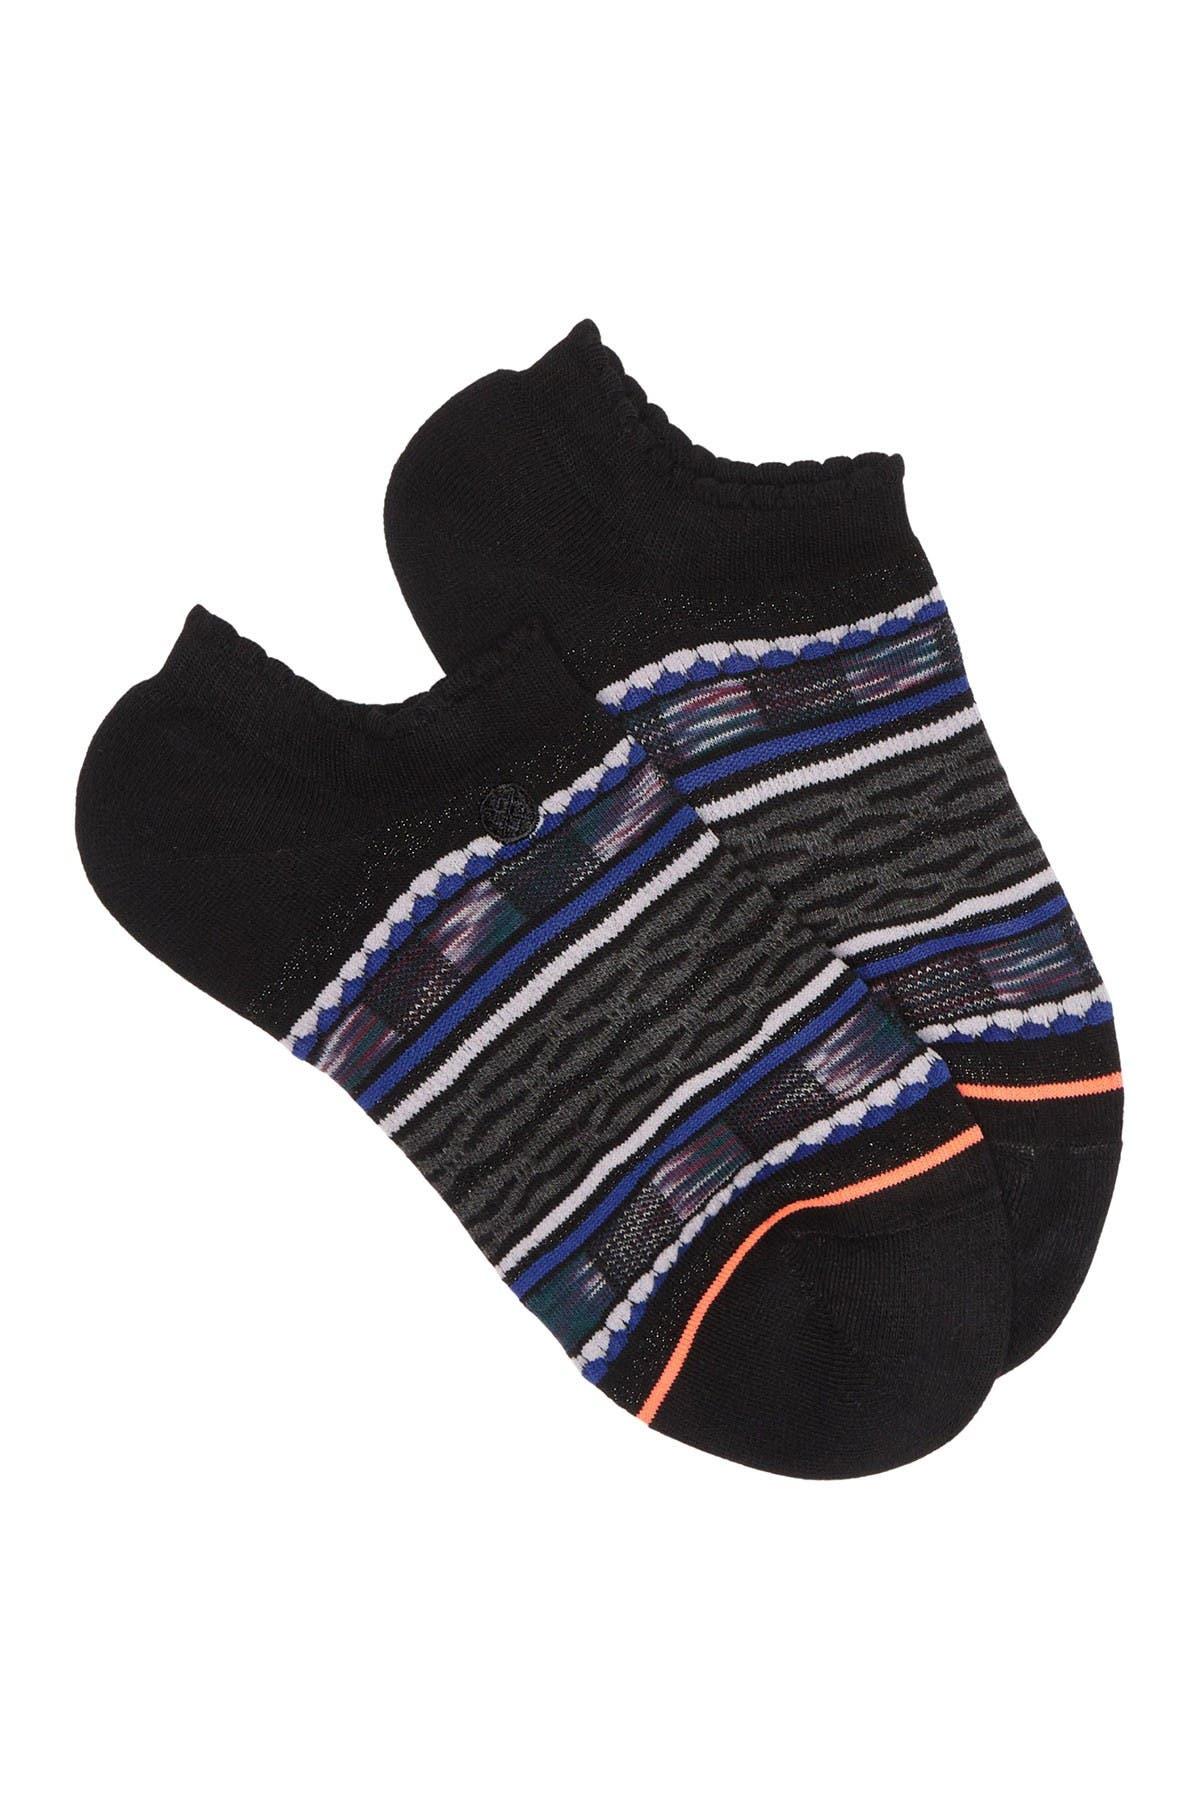 Image of Stance Terraform Low Cut Socks